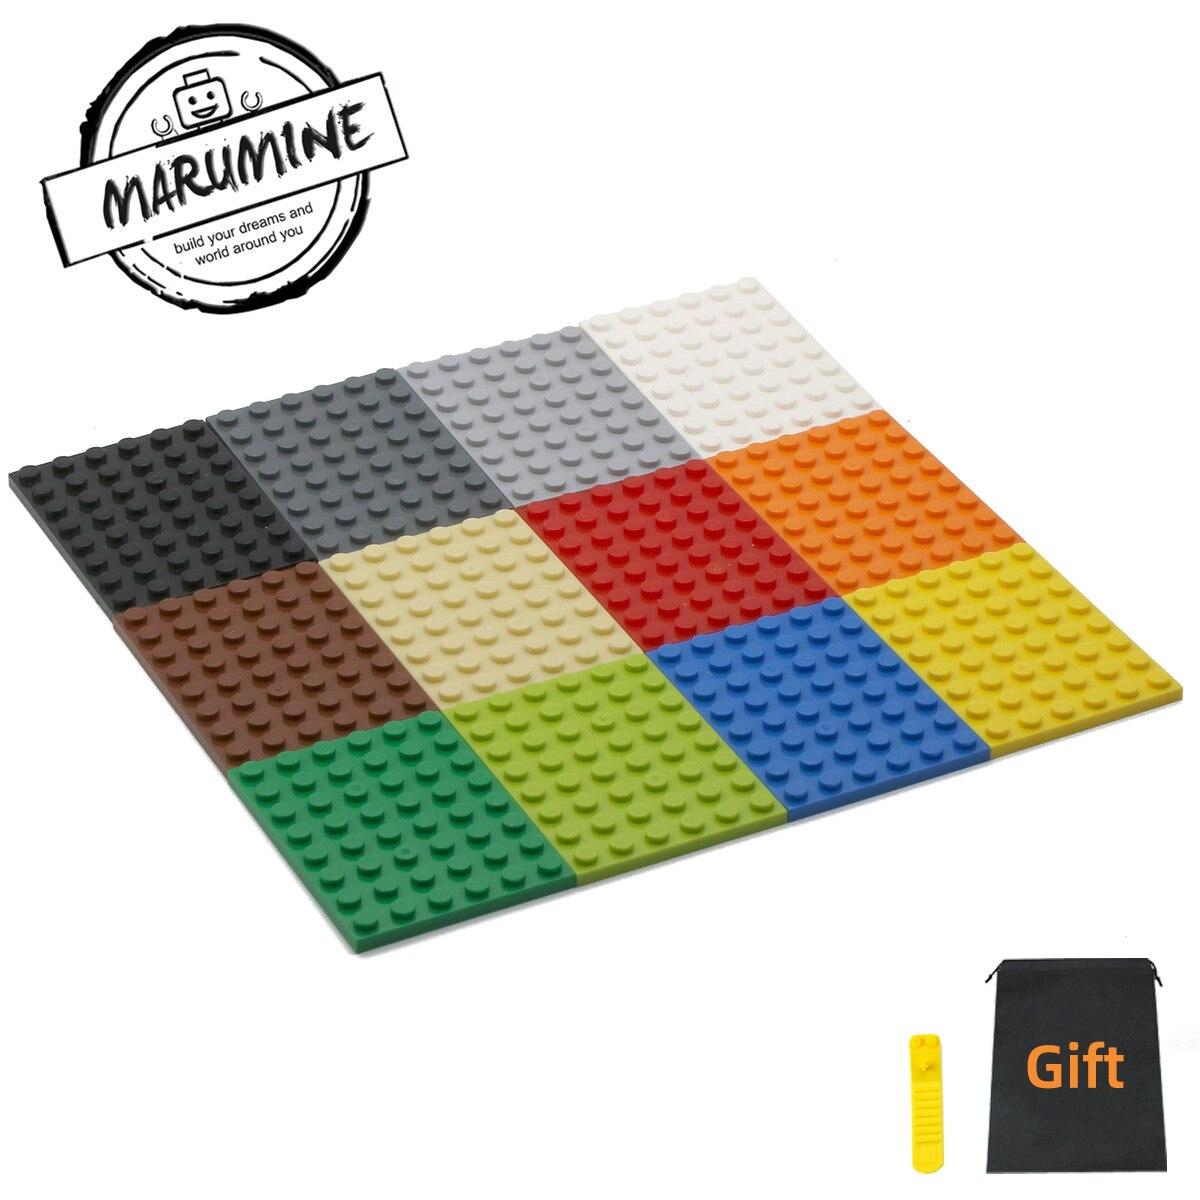 MARUMINE 20PCS 6 X 8 Dots Base Plate Building Blocks 3036 DIY Classic Educational Bricks Parts Bulk For Construction